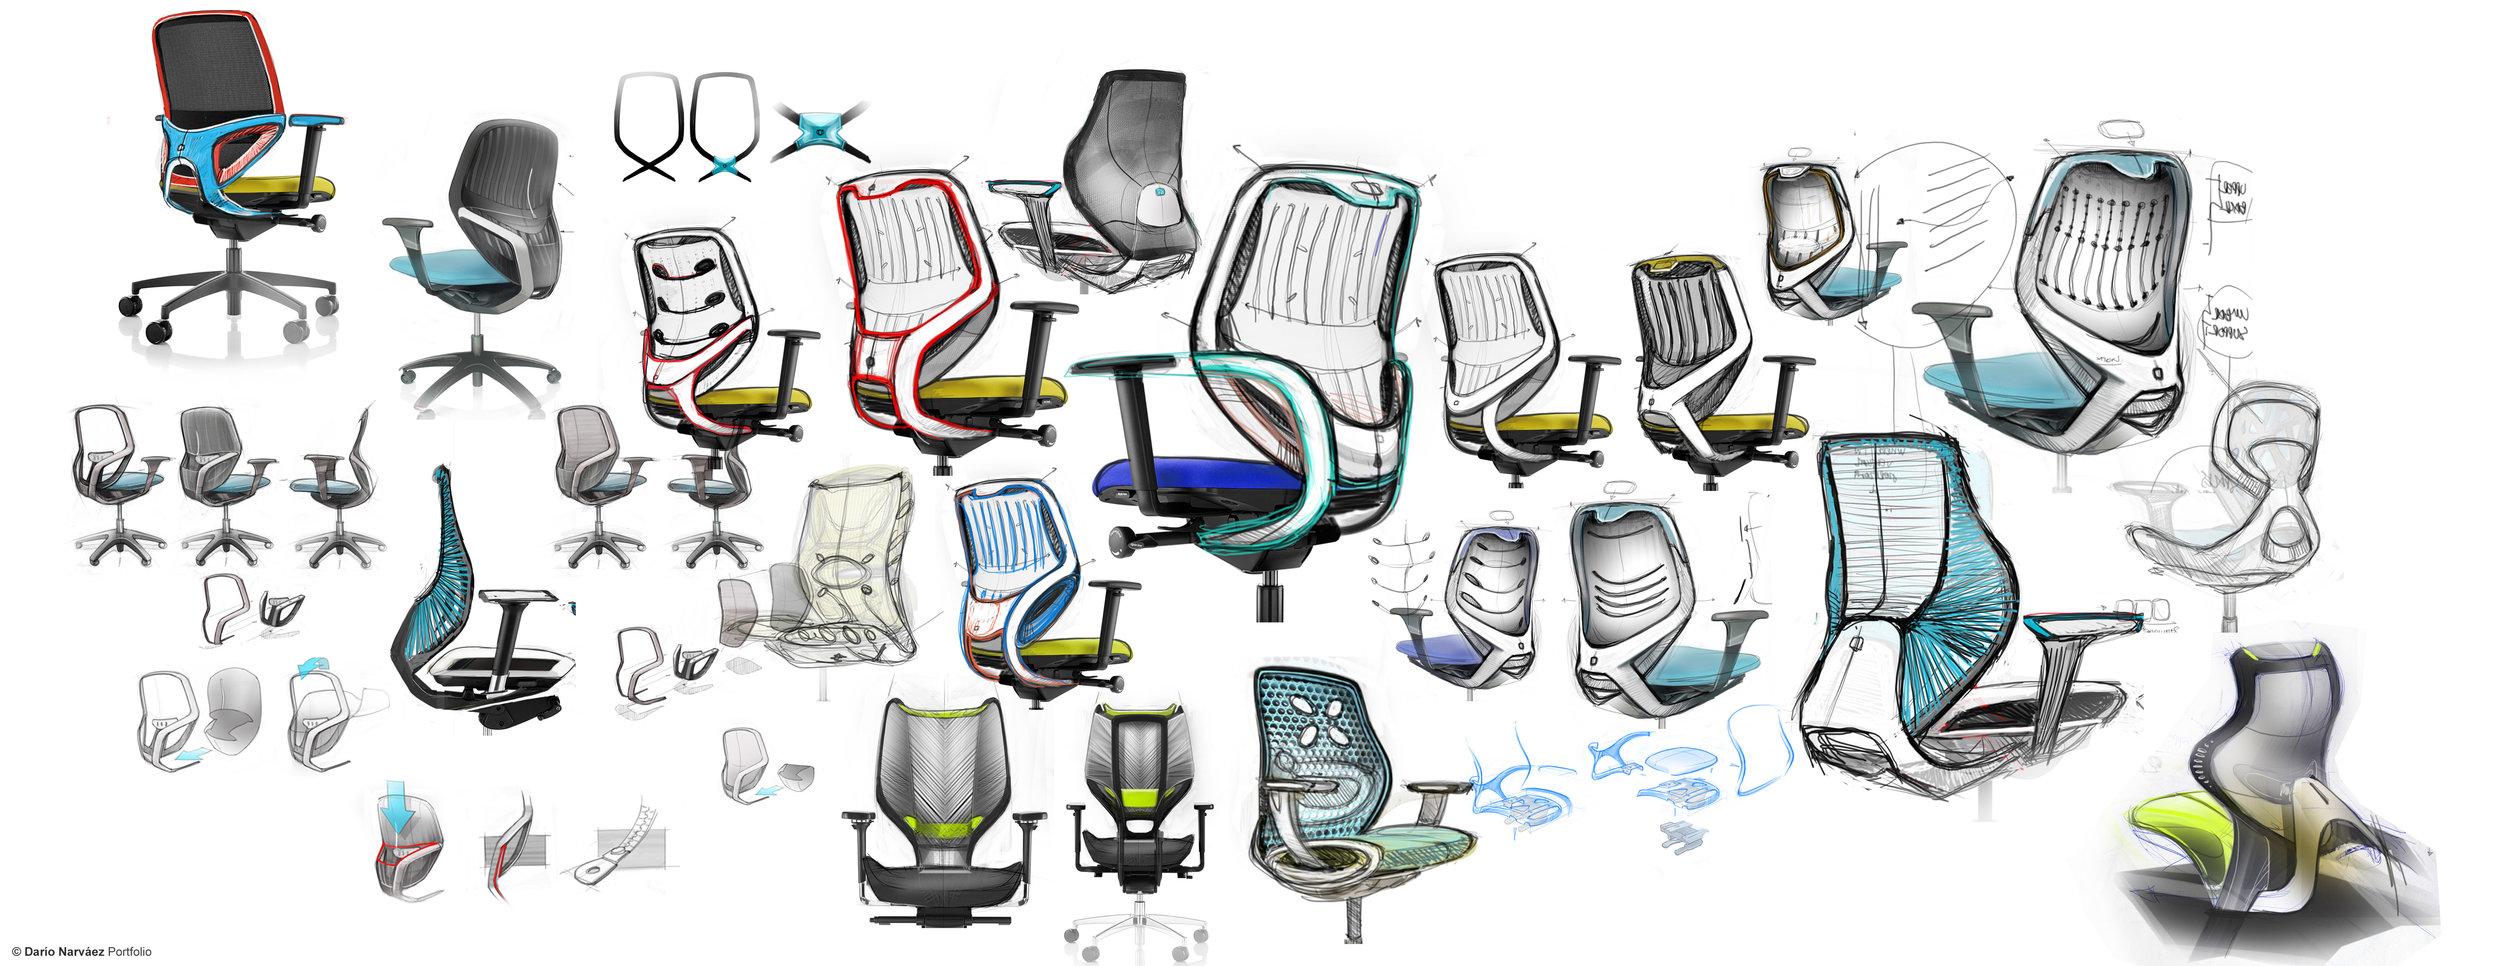 02G_DarioNarvaez_Portfolio_Ingo_Chair_Concept_Development_WEB-1.jpg